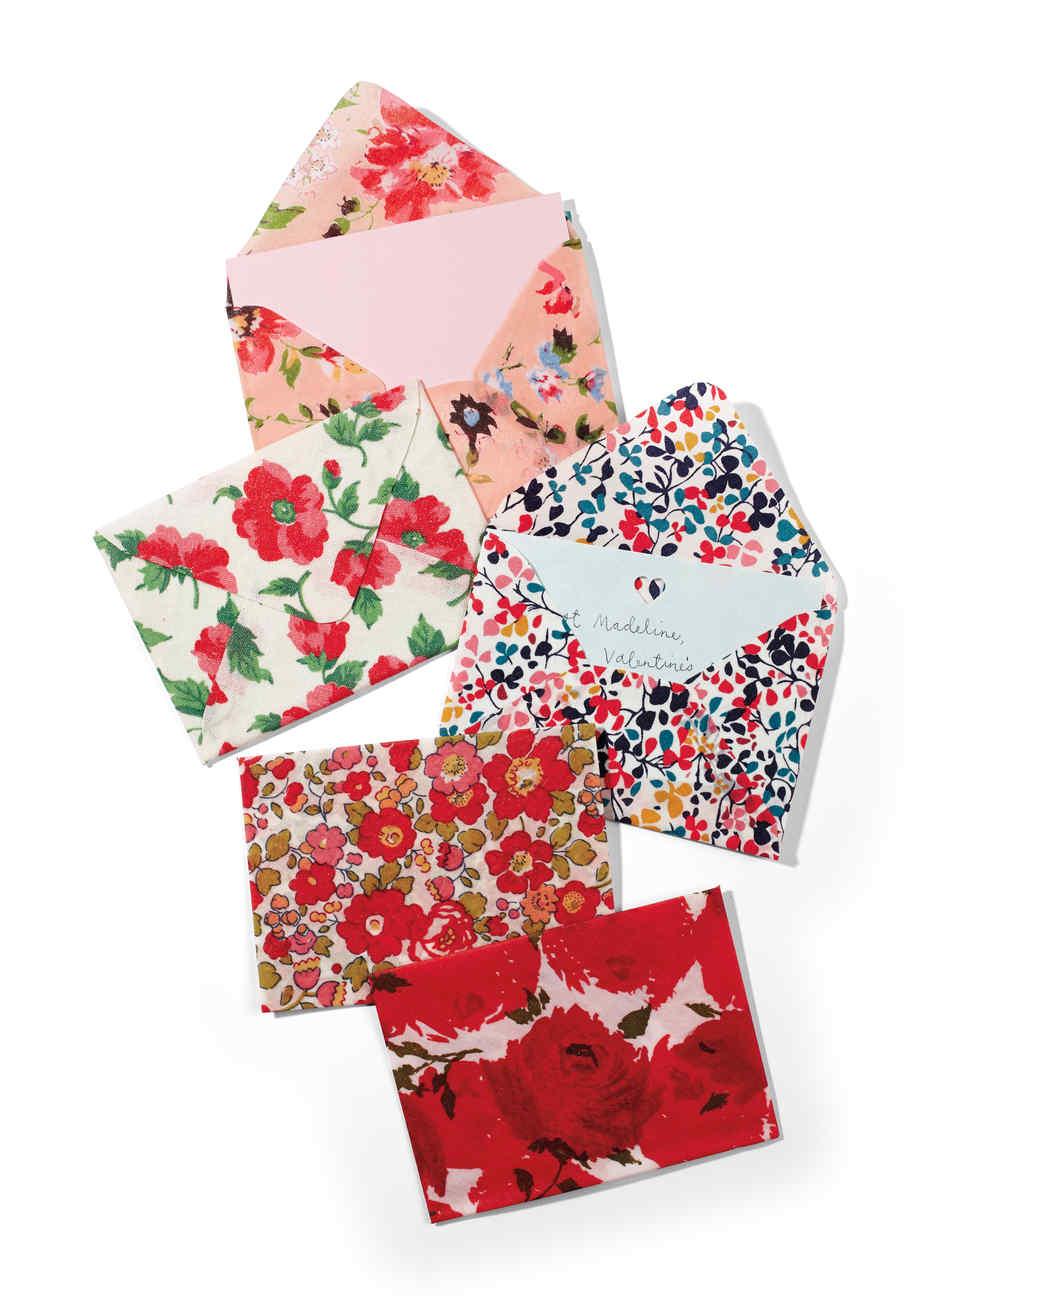 crafts-envelopes-012-mld110777.jpg